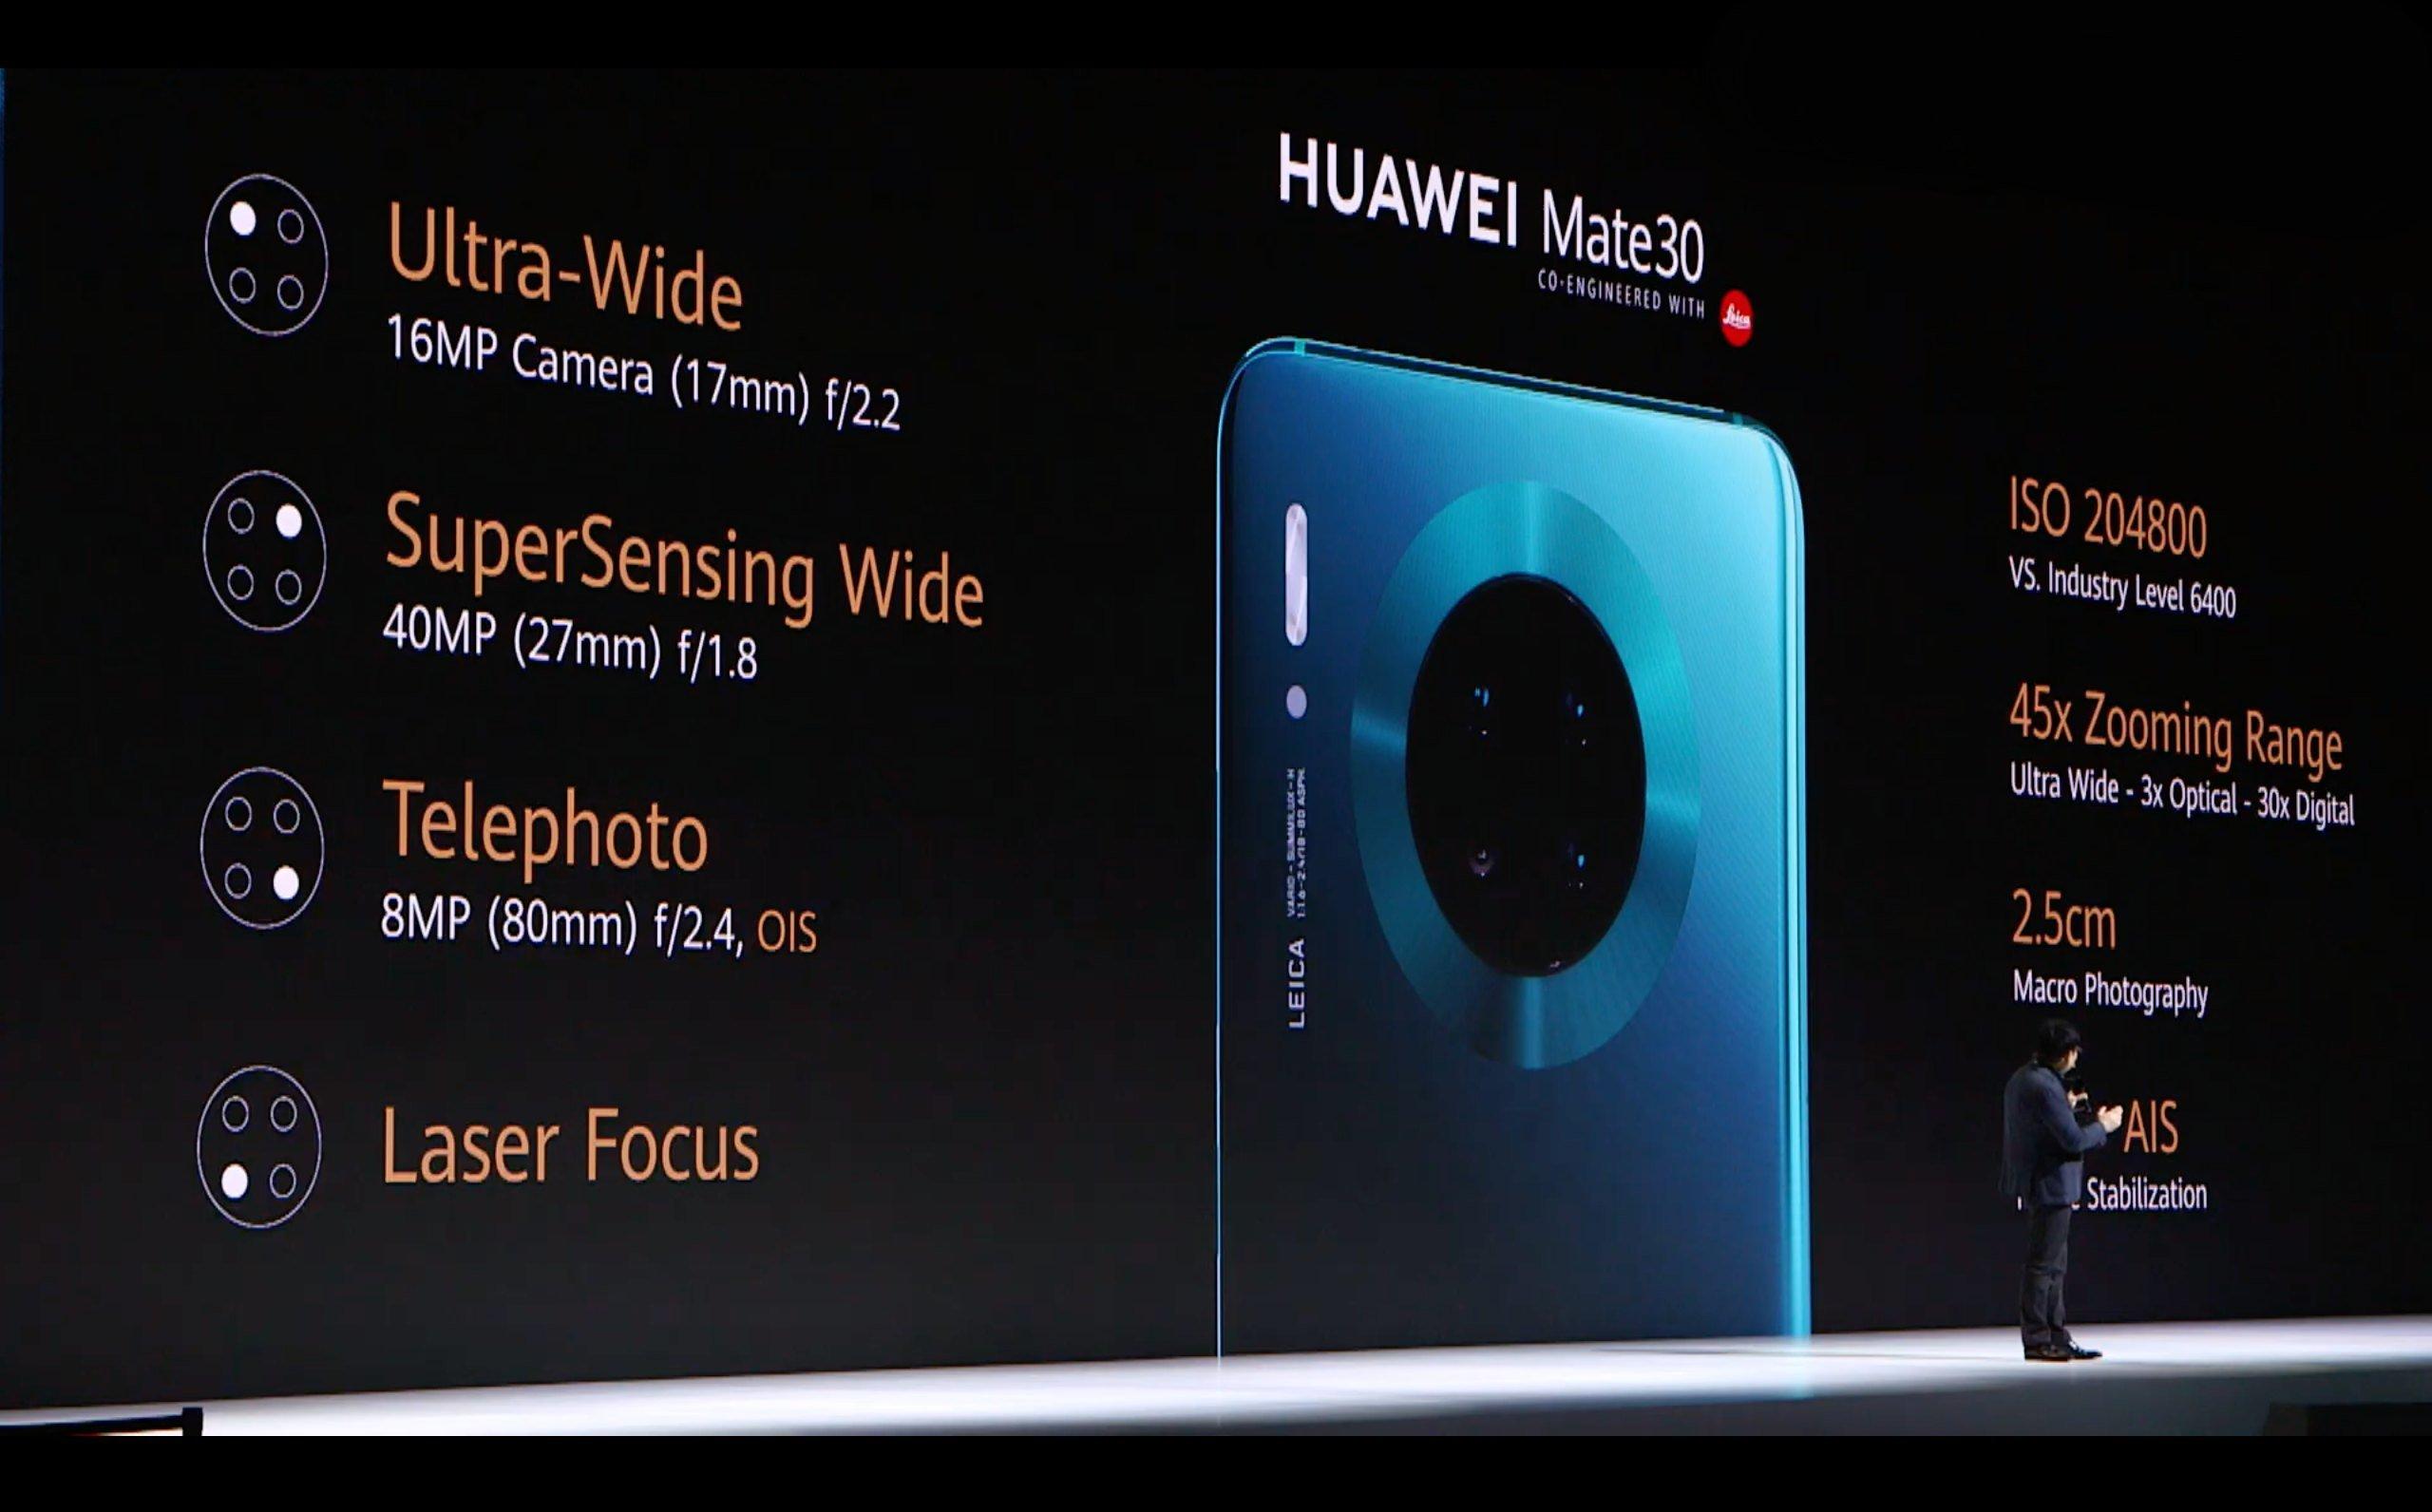 Huawei Mate 30 kamera özellikleri